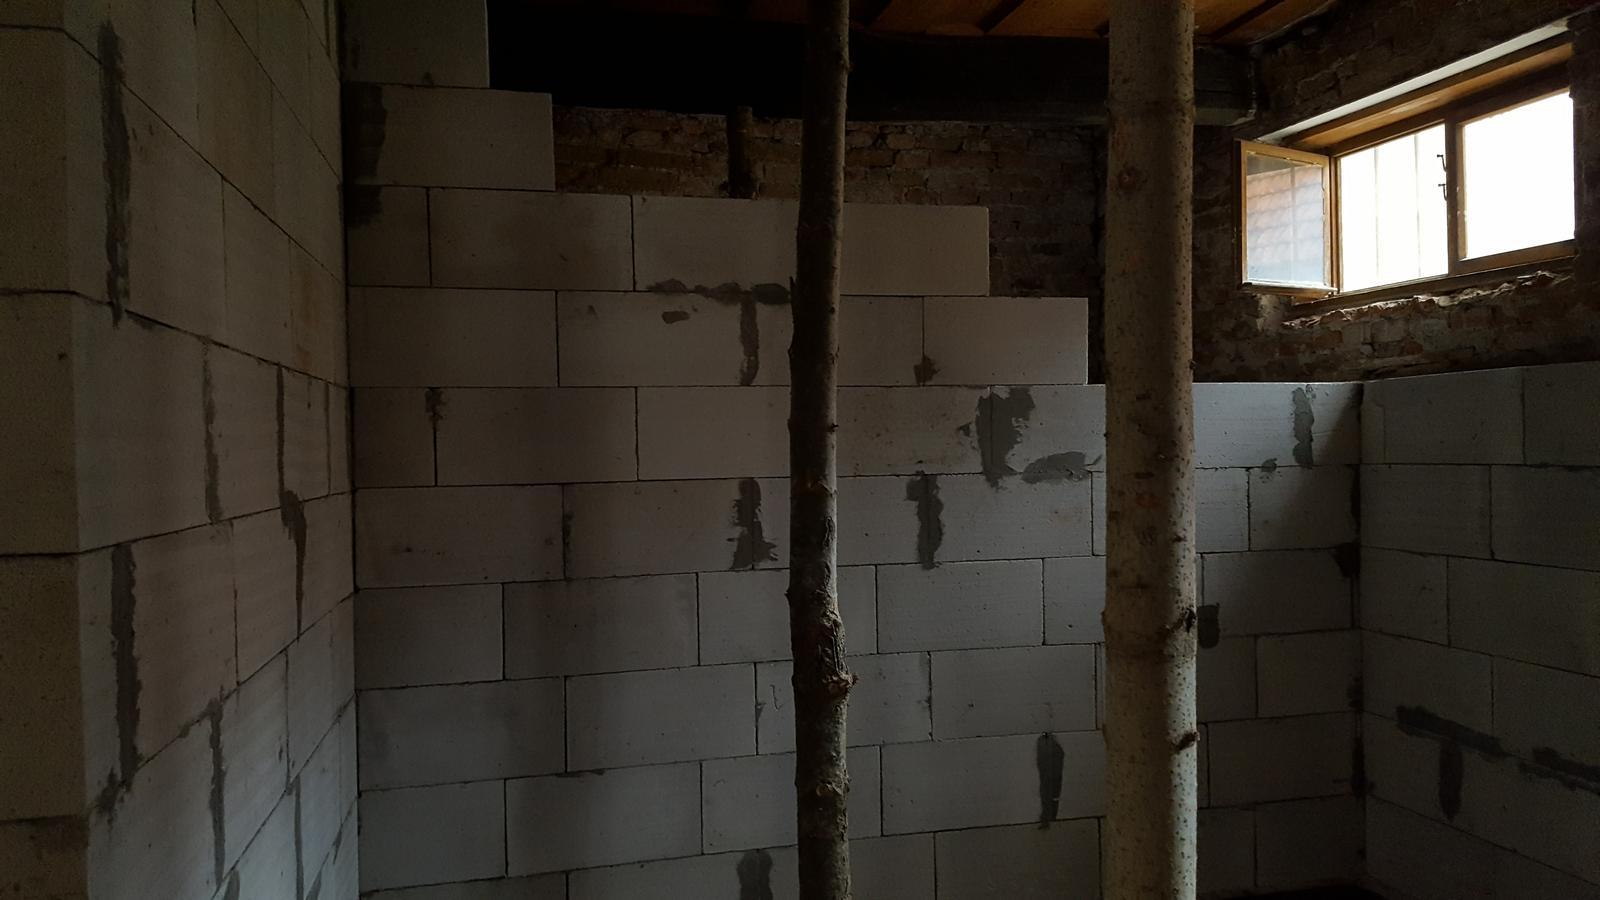 Prerabka domu v historickom centre - umyvadlova stena pripravena na vodu/odpad instalacie teraz budeme robit pripravu na okna